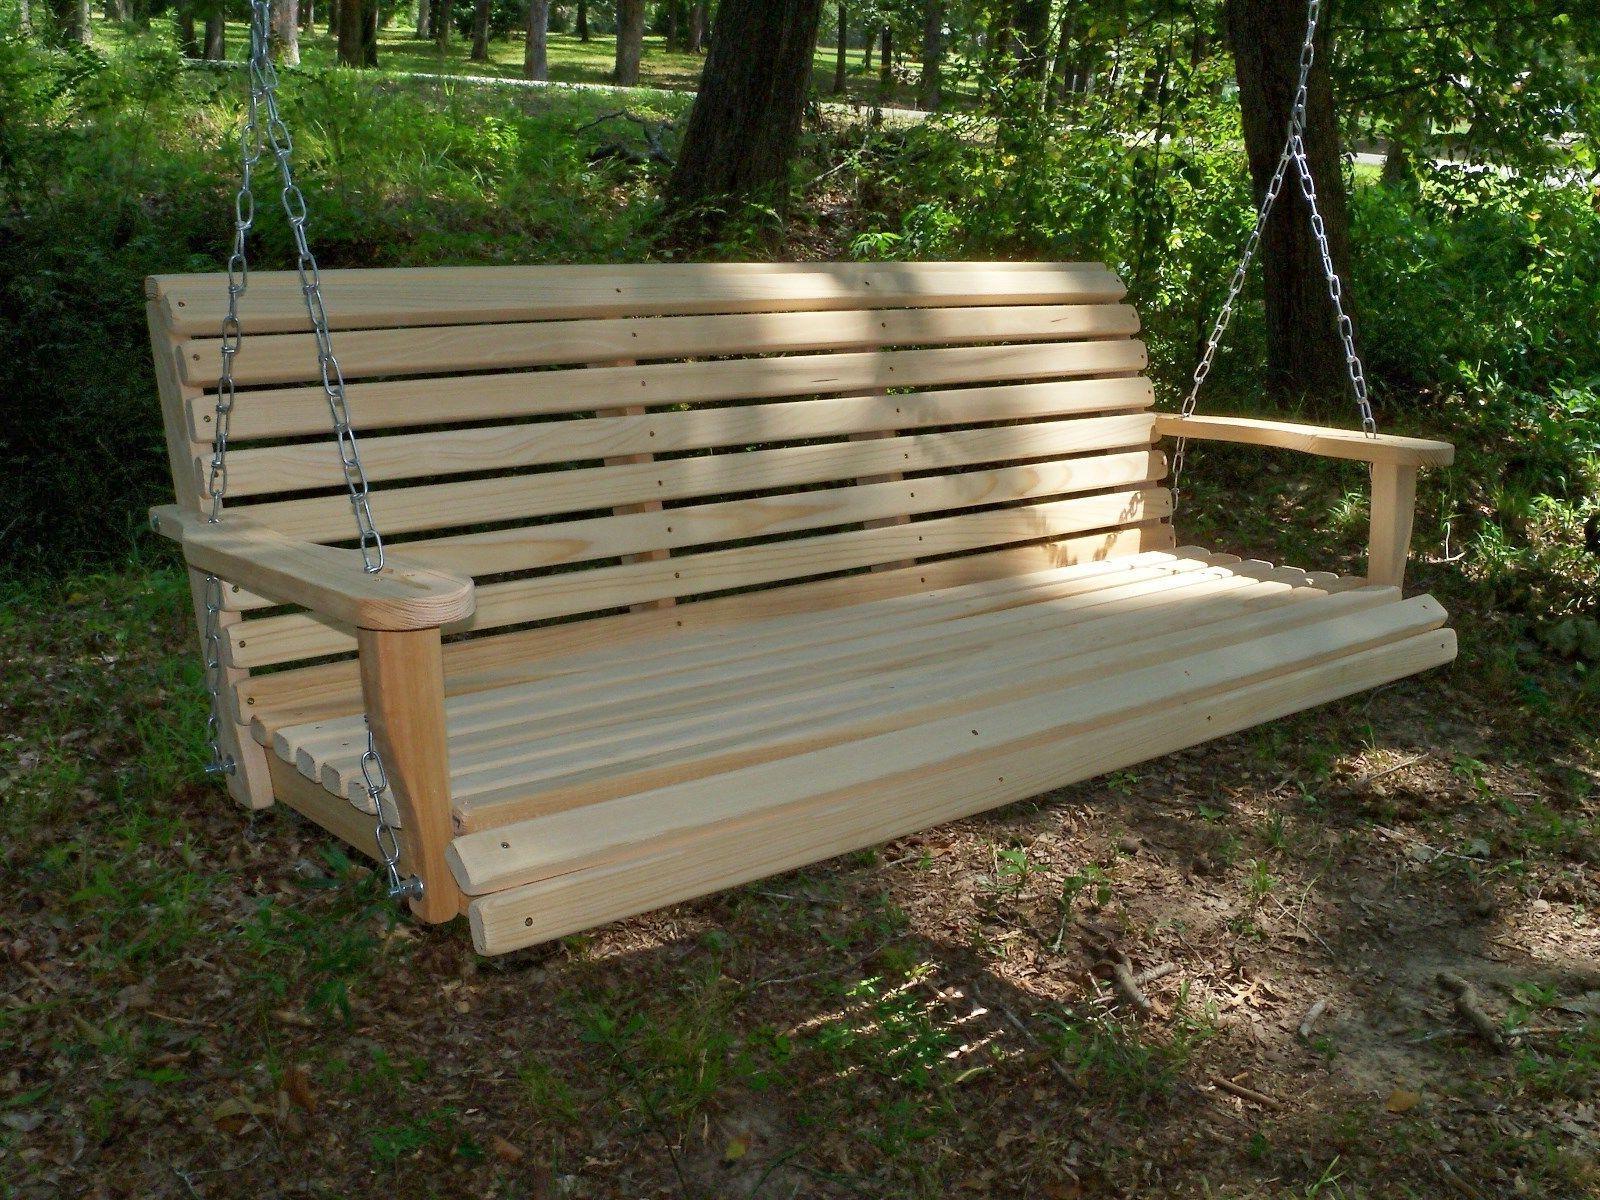 5ft reg cypress wood wooden porch bench